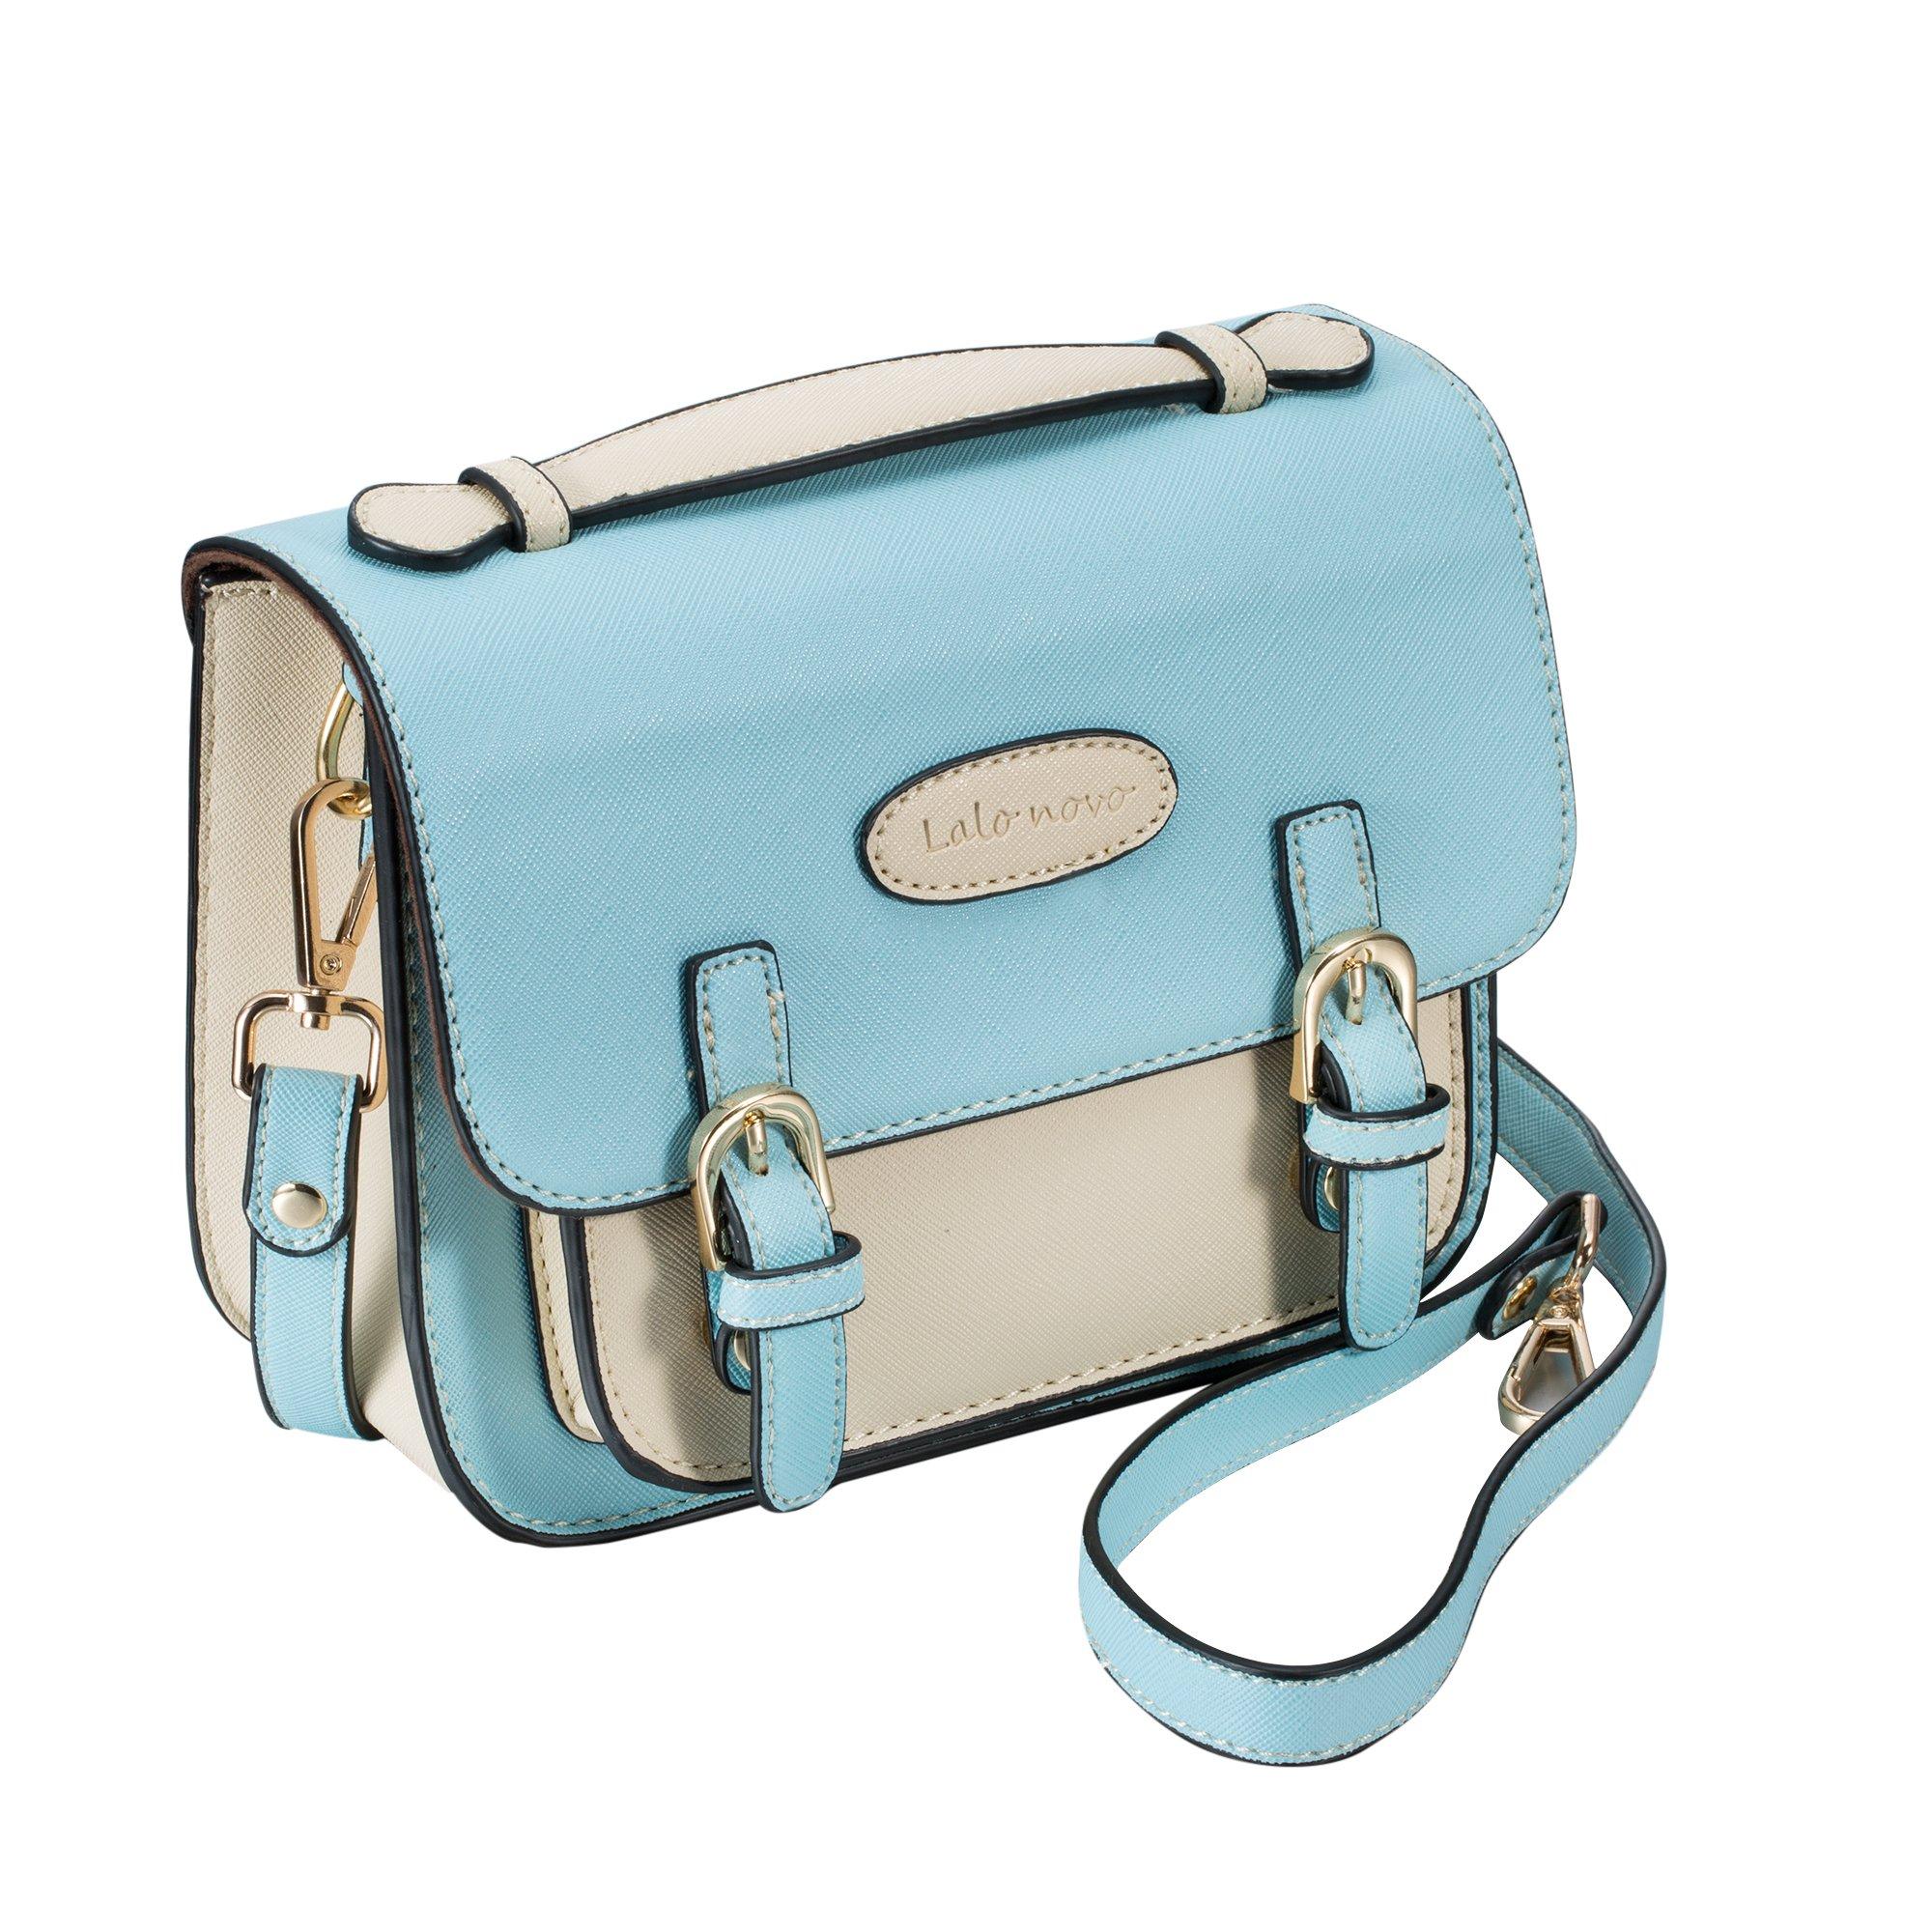 Mini 9 Instant Camera Accessories Case - Lalonovo Retro Vintage PU Leather Bag for Fujifilm Instax Mini 9/ Mini 8/ Mini 25/ Mini 50s/ Mini 90/ Mini 9 Instant Film Camera with Shoulder Strap (Blue)